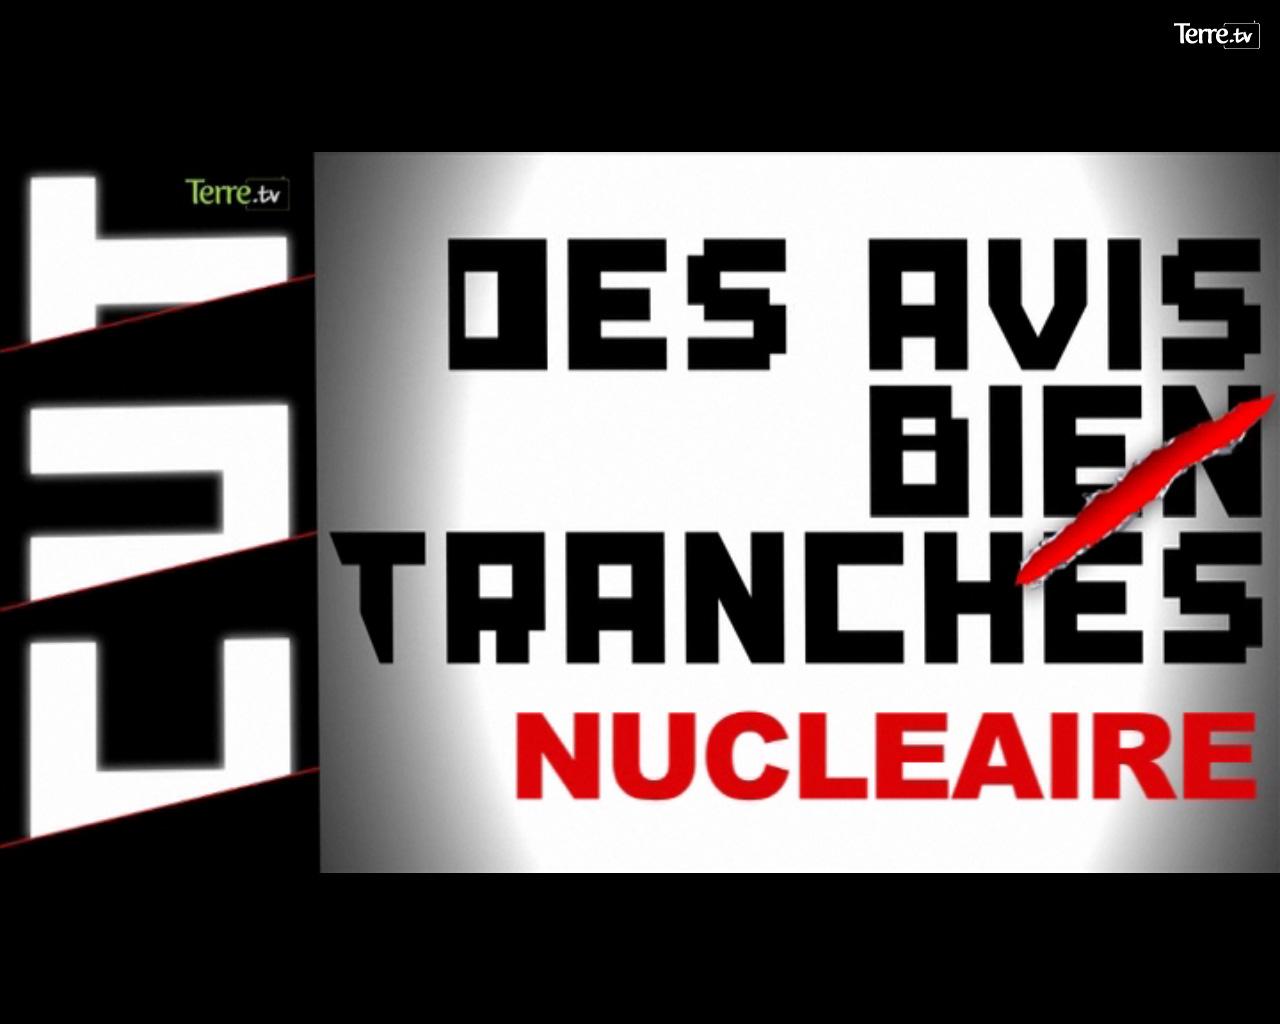 Cut_nucleaire